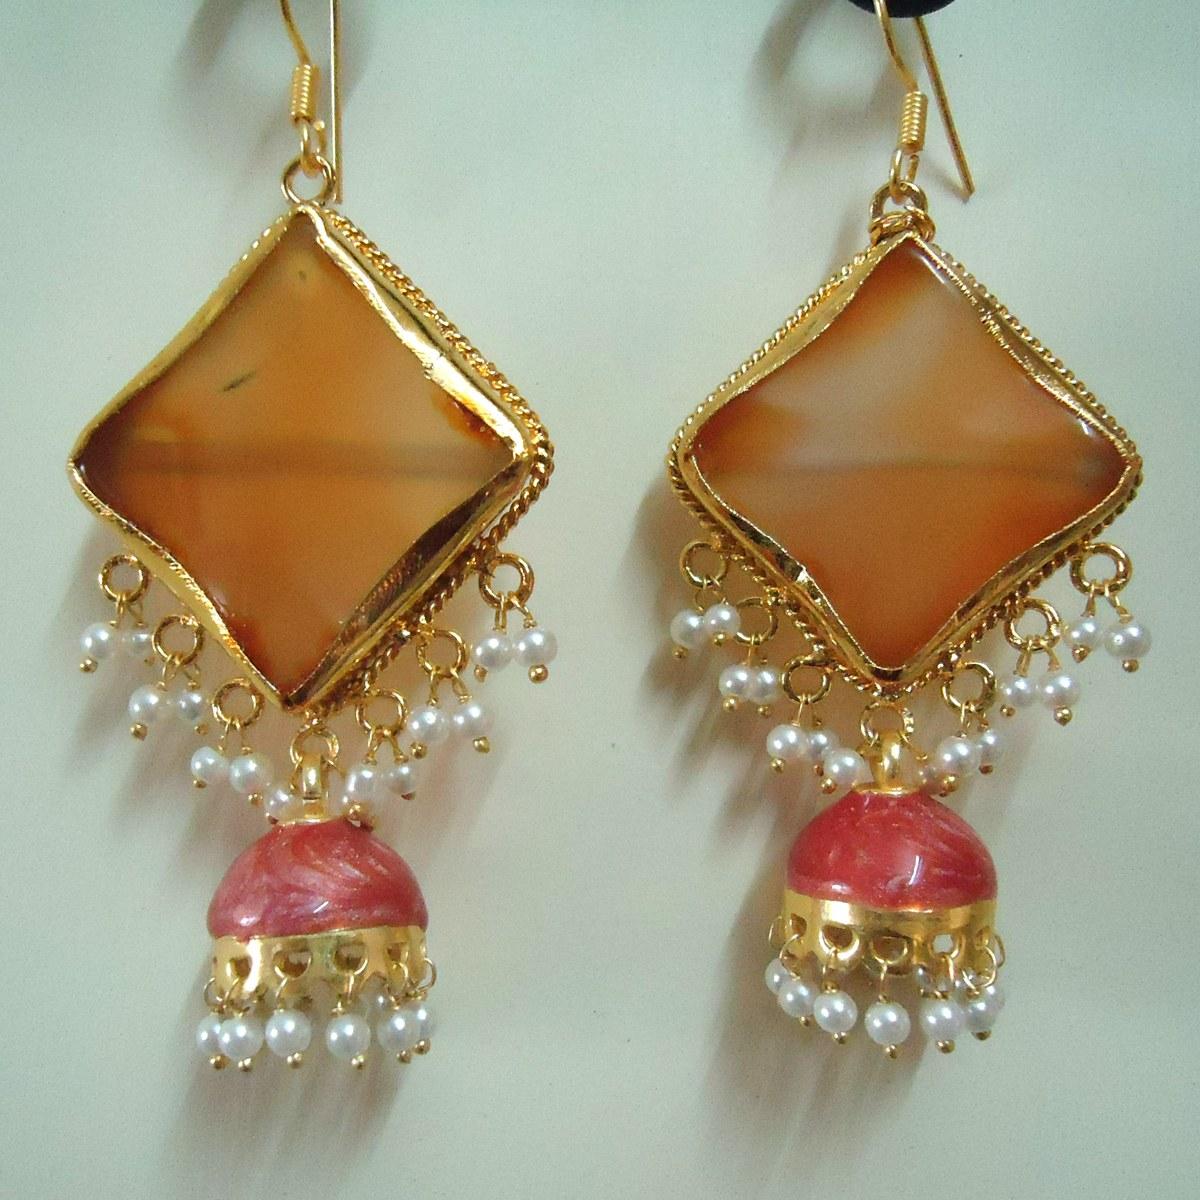 Semi precious stone jewellery online shopping